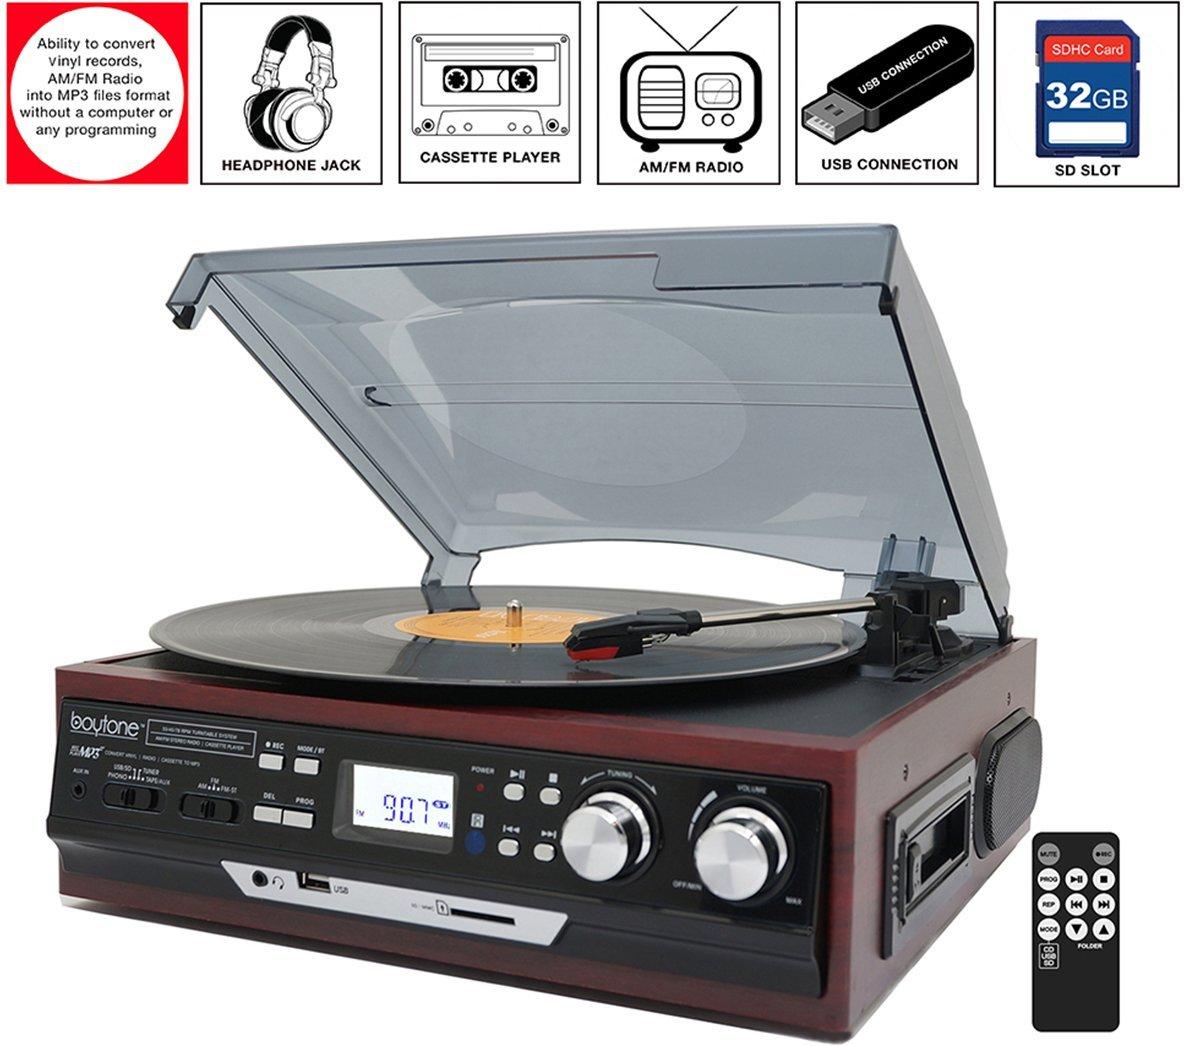 Electronic Palace: Boytone BT-17DJM-C 3-speed Stereo Turntable, 2 ...